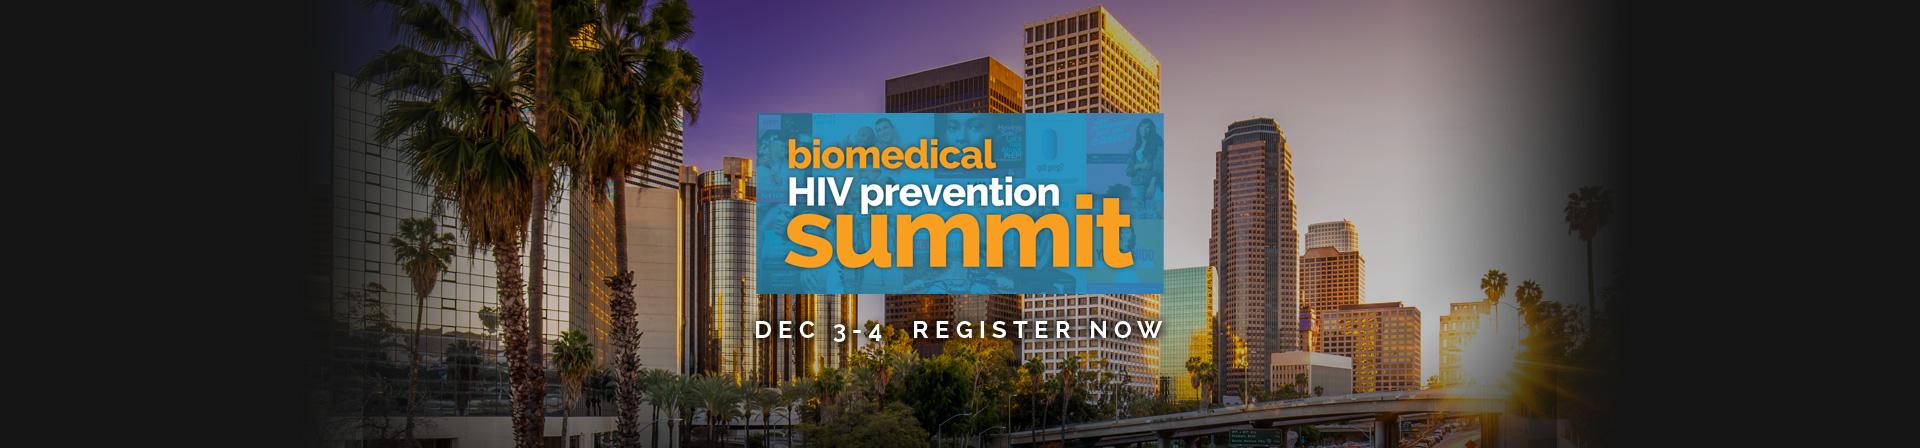 Biomedical HIV Prevention Summit - Dec 3-4, 2018 - Register Now